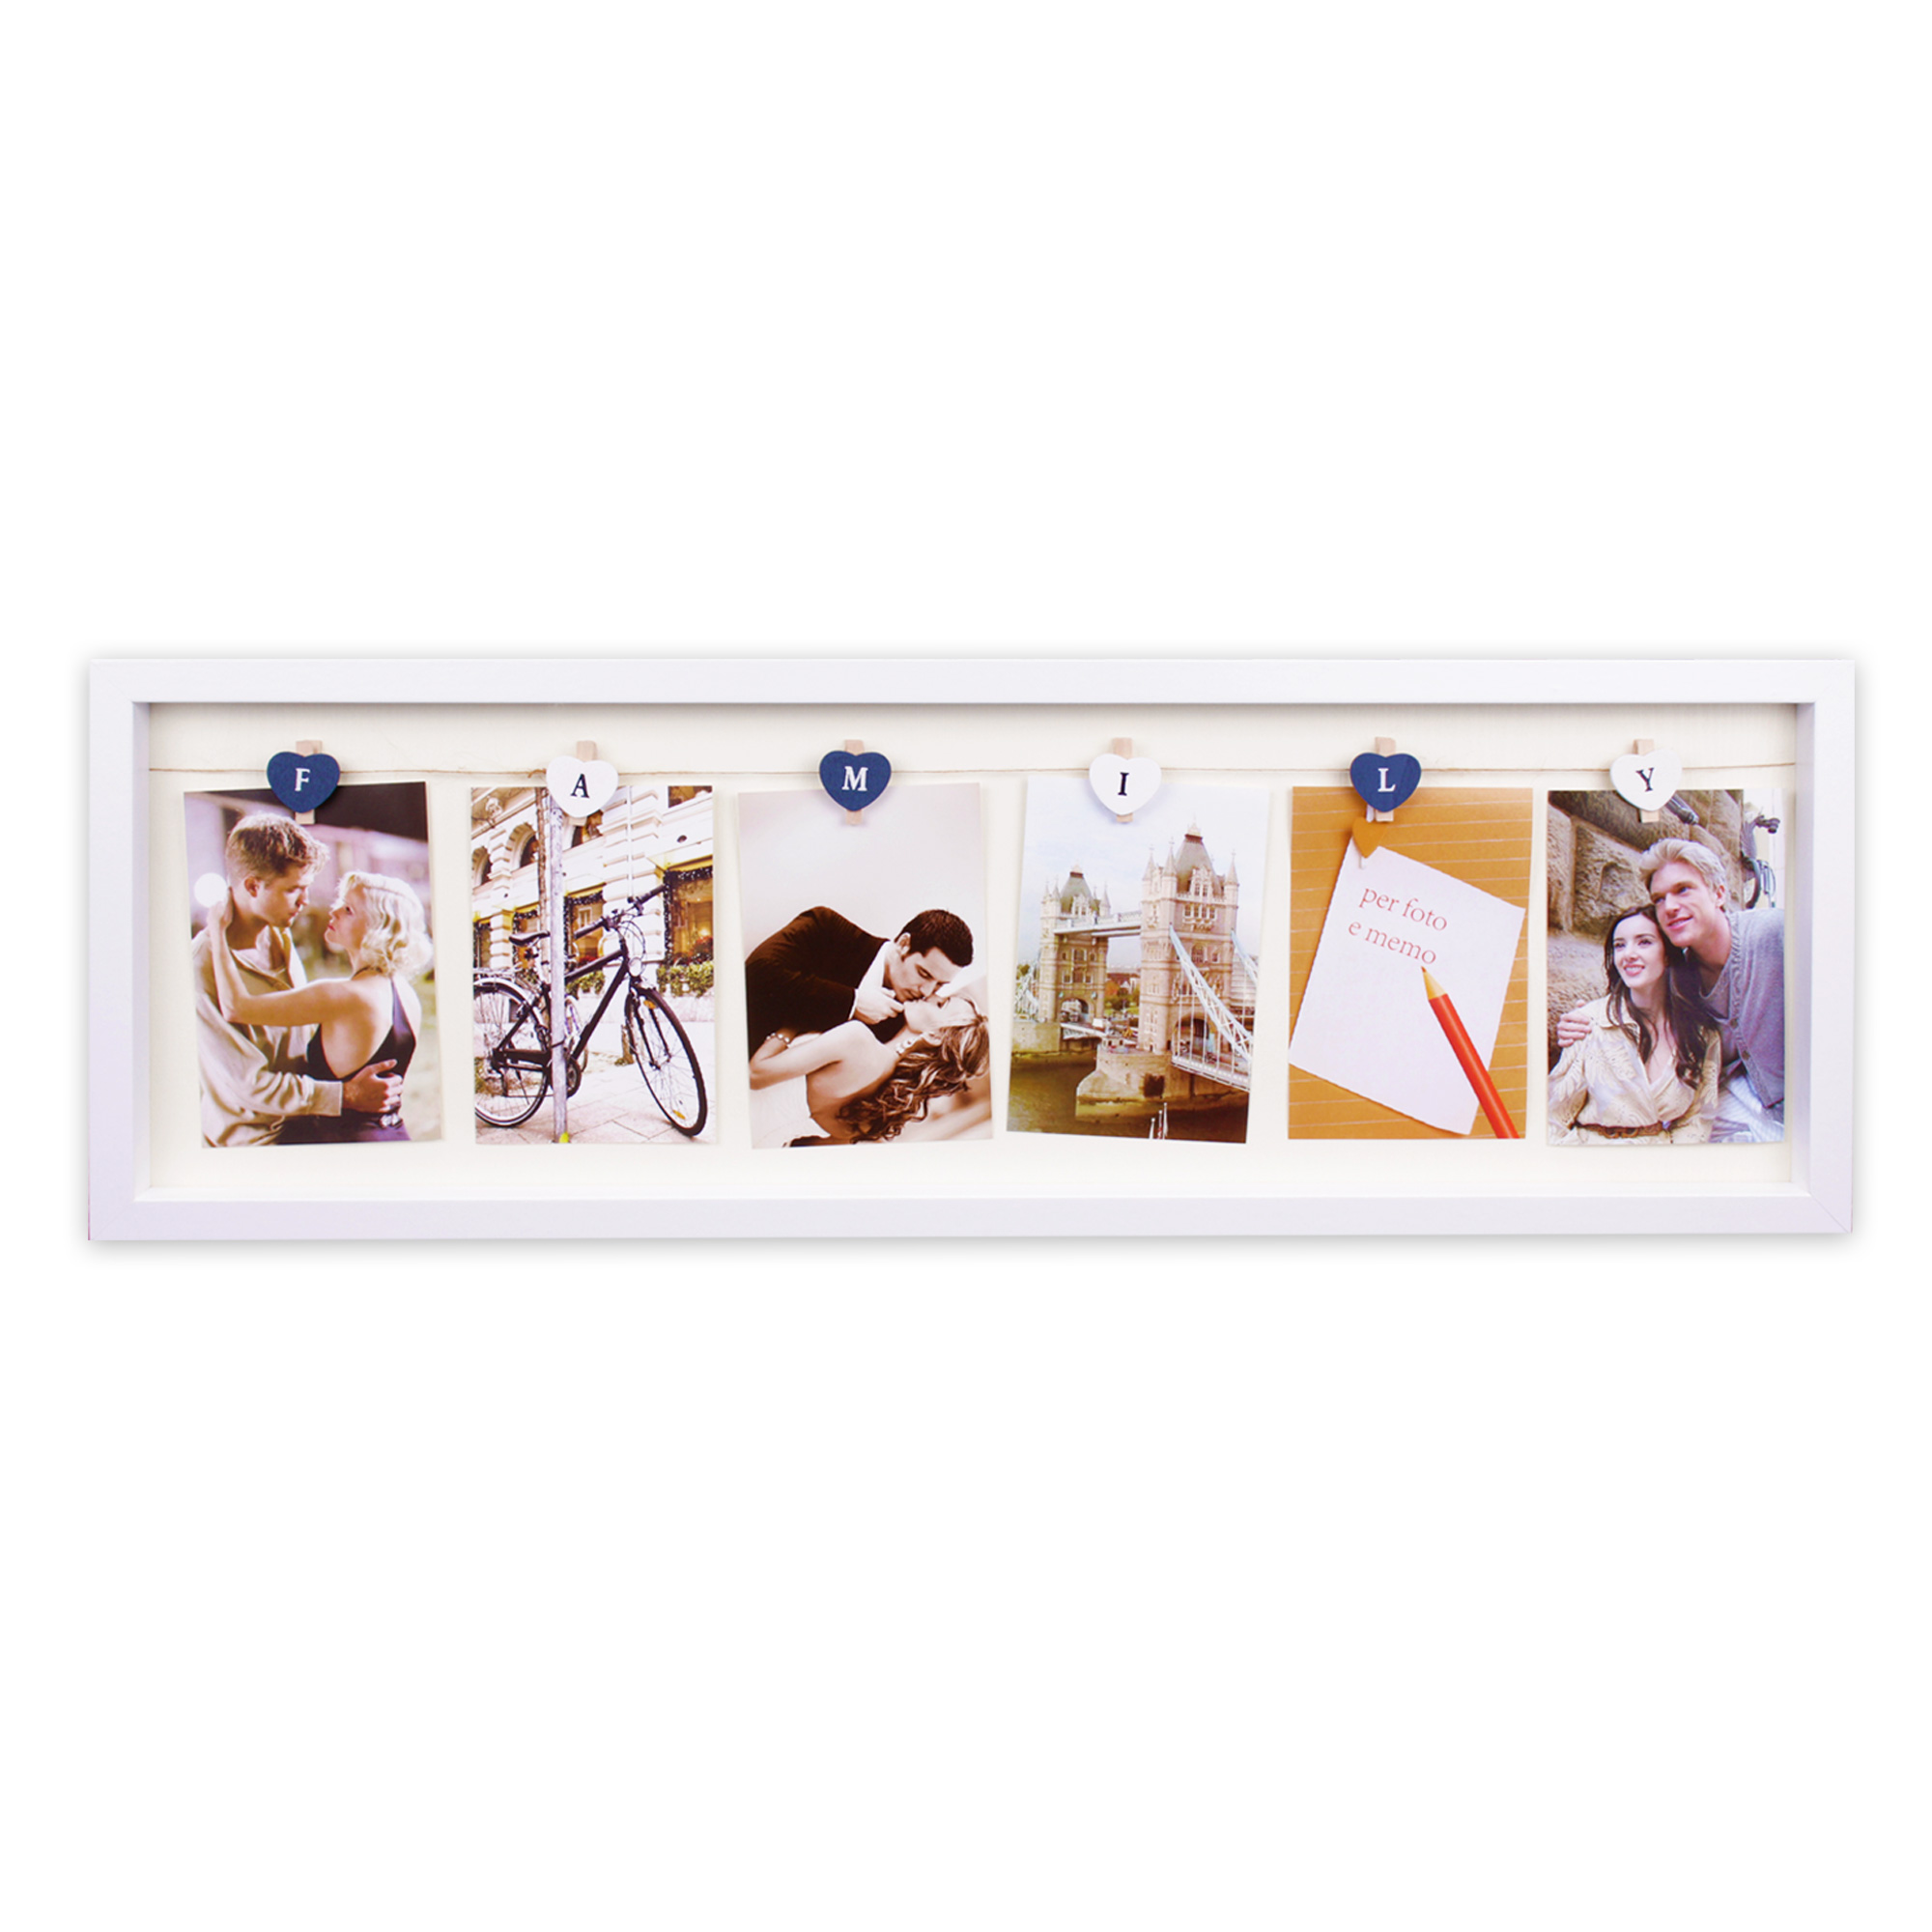 bilderrahmen aus mdf 24 x 72 x 3 cm f r 6 fotos 10 x 15 cm modell family weiss. Black Bedroom Furniture Sets. Home Design Ideas